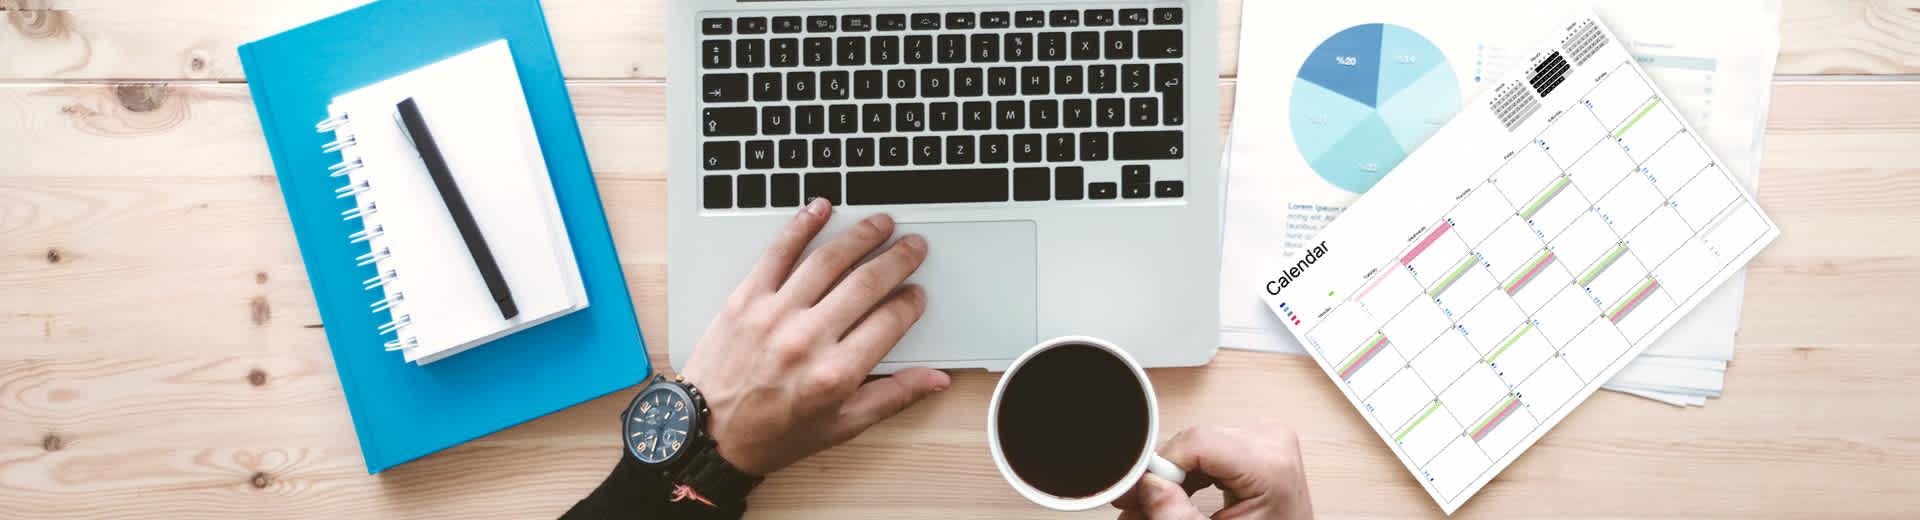 online meeting request